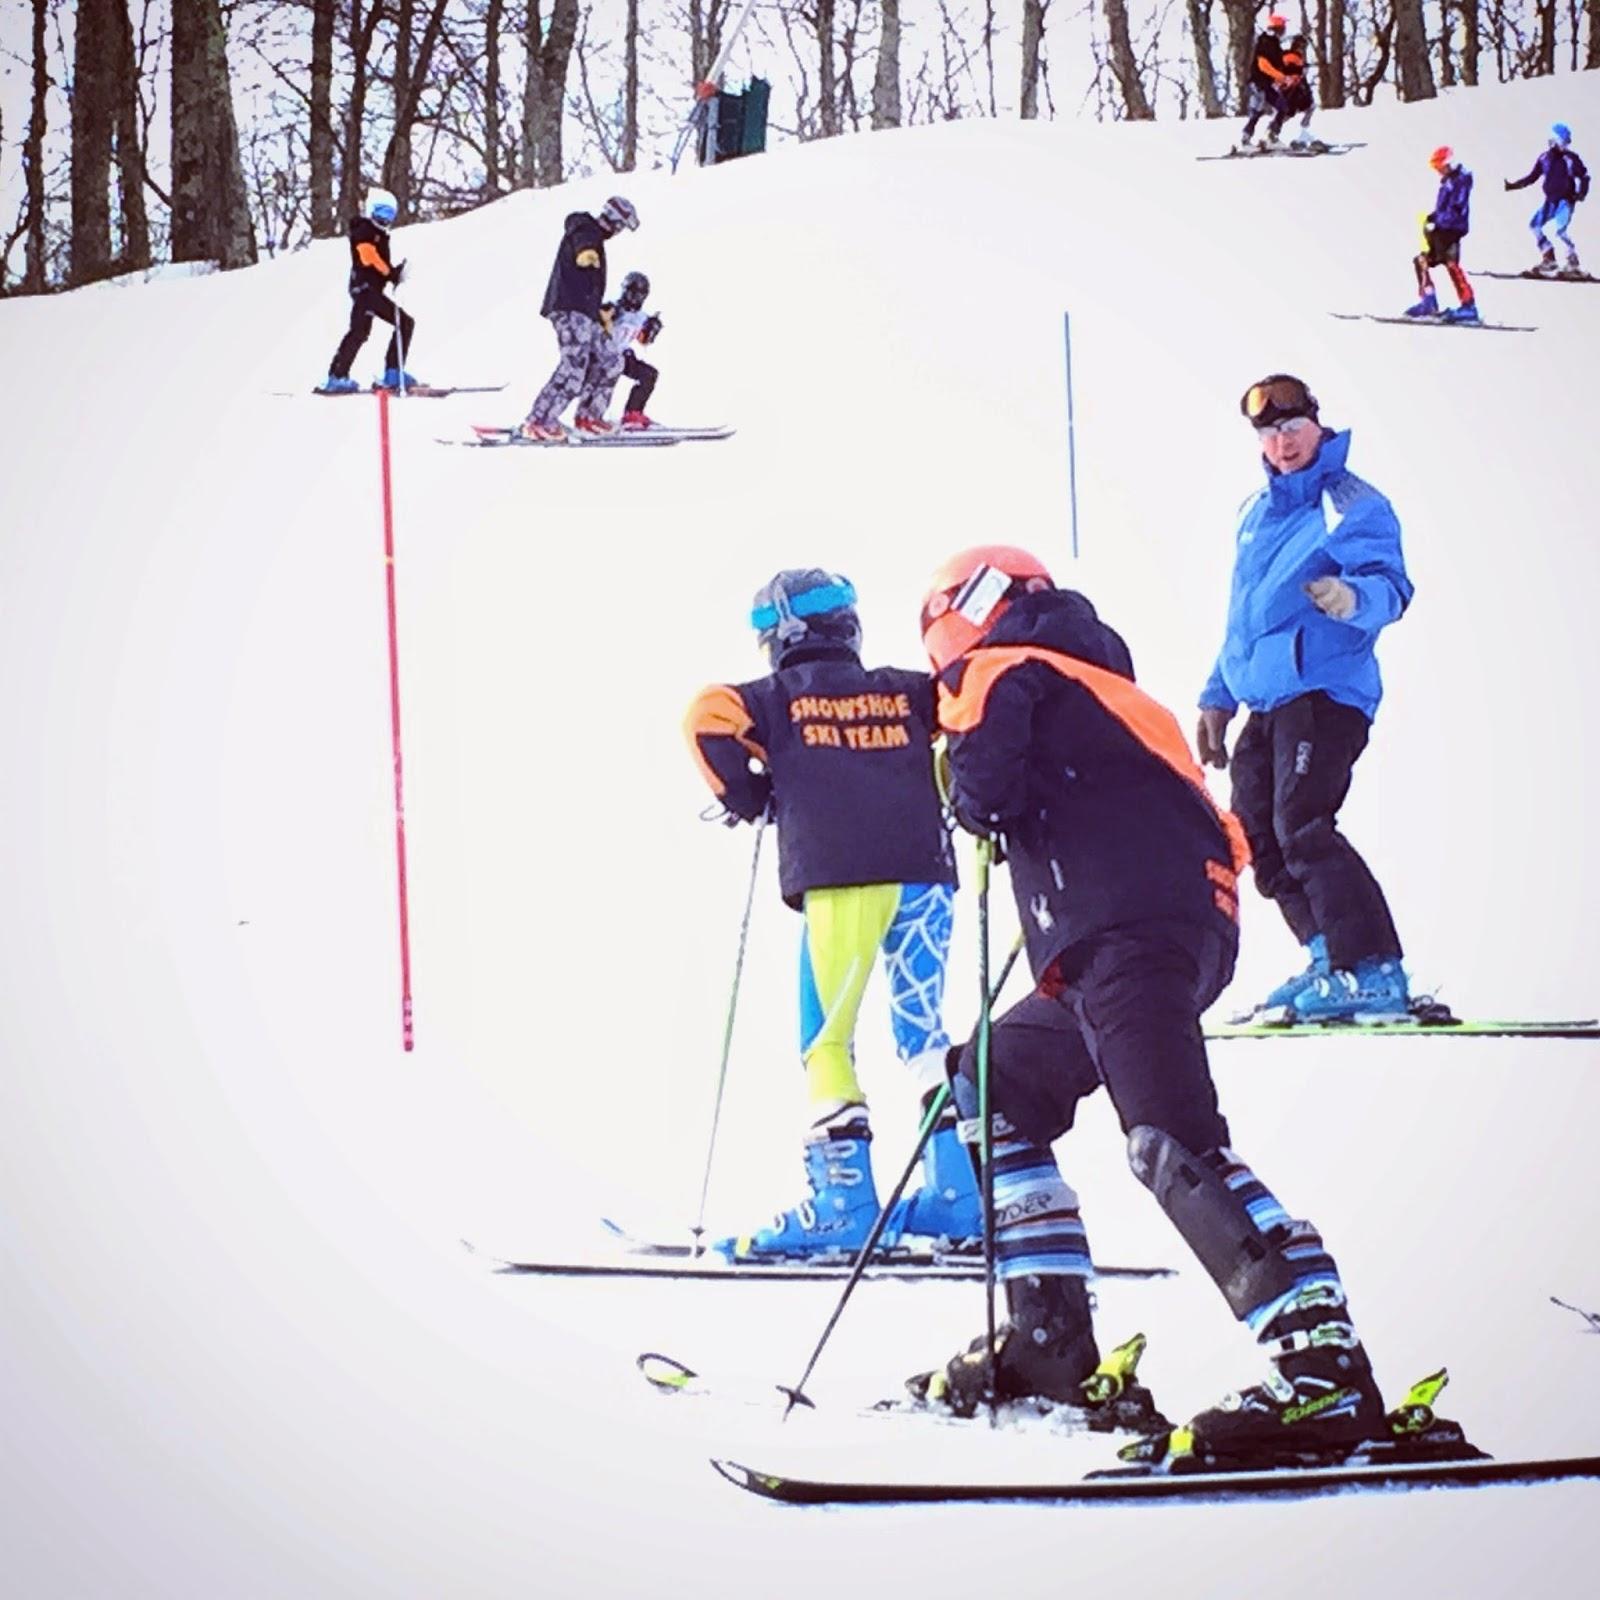 Snowshoe, race team, SARA, Wintergreen Resort, Virginia, ski,